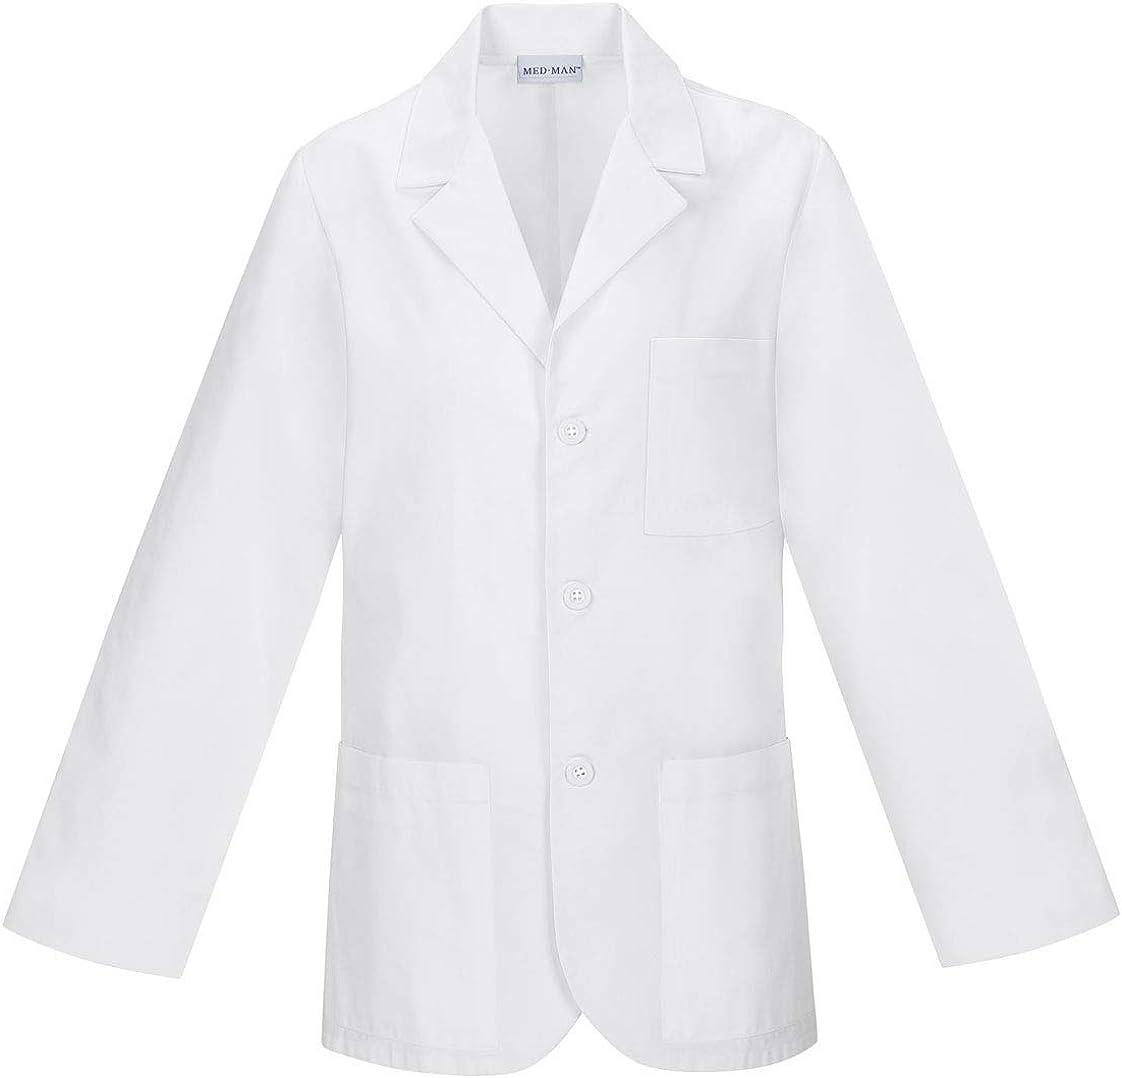 "MEDMAN 31"" Men's Consultation Lab Coat: Clothing"